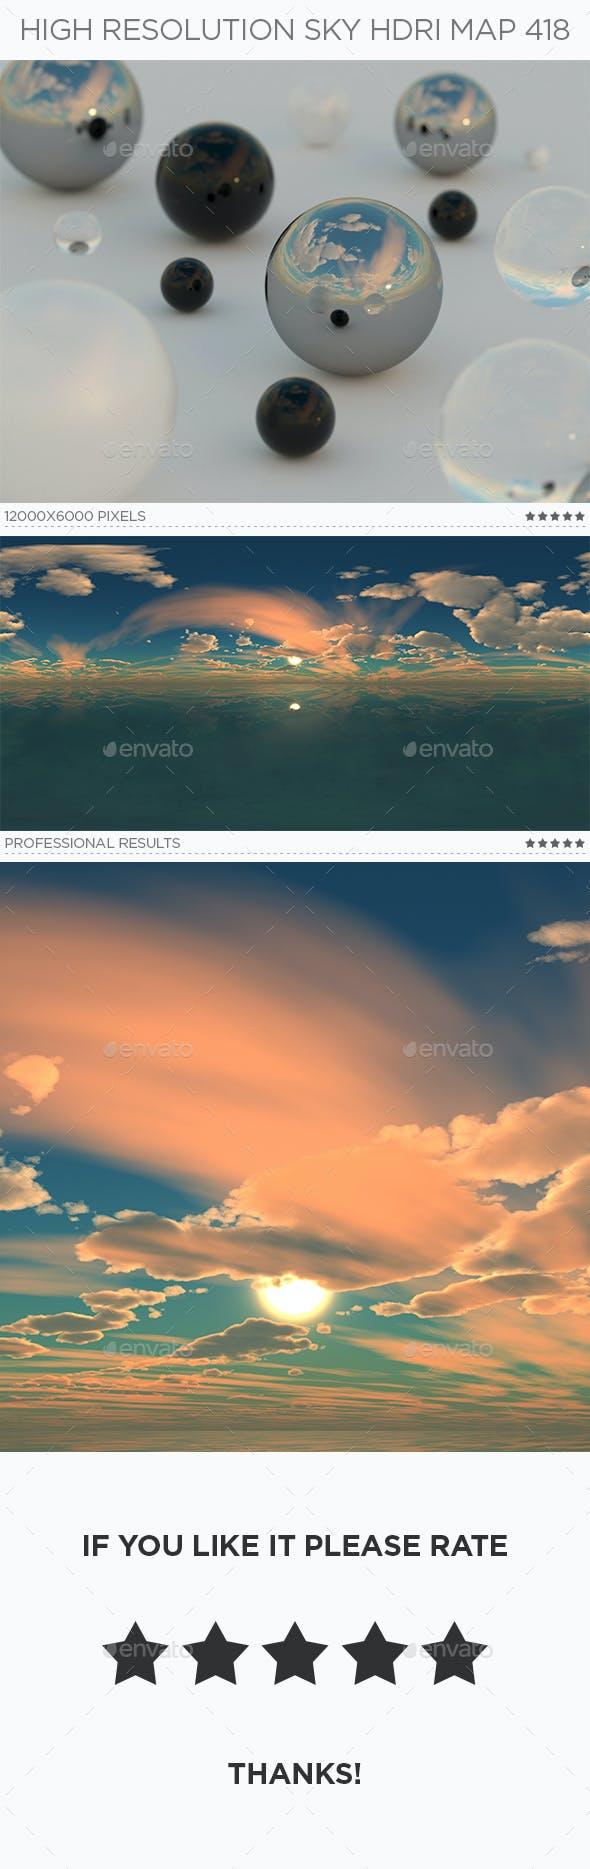 High Resolution Sky HDRi Map 418 - 3DOcean Item for Sale